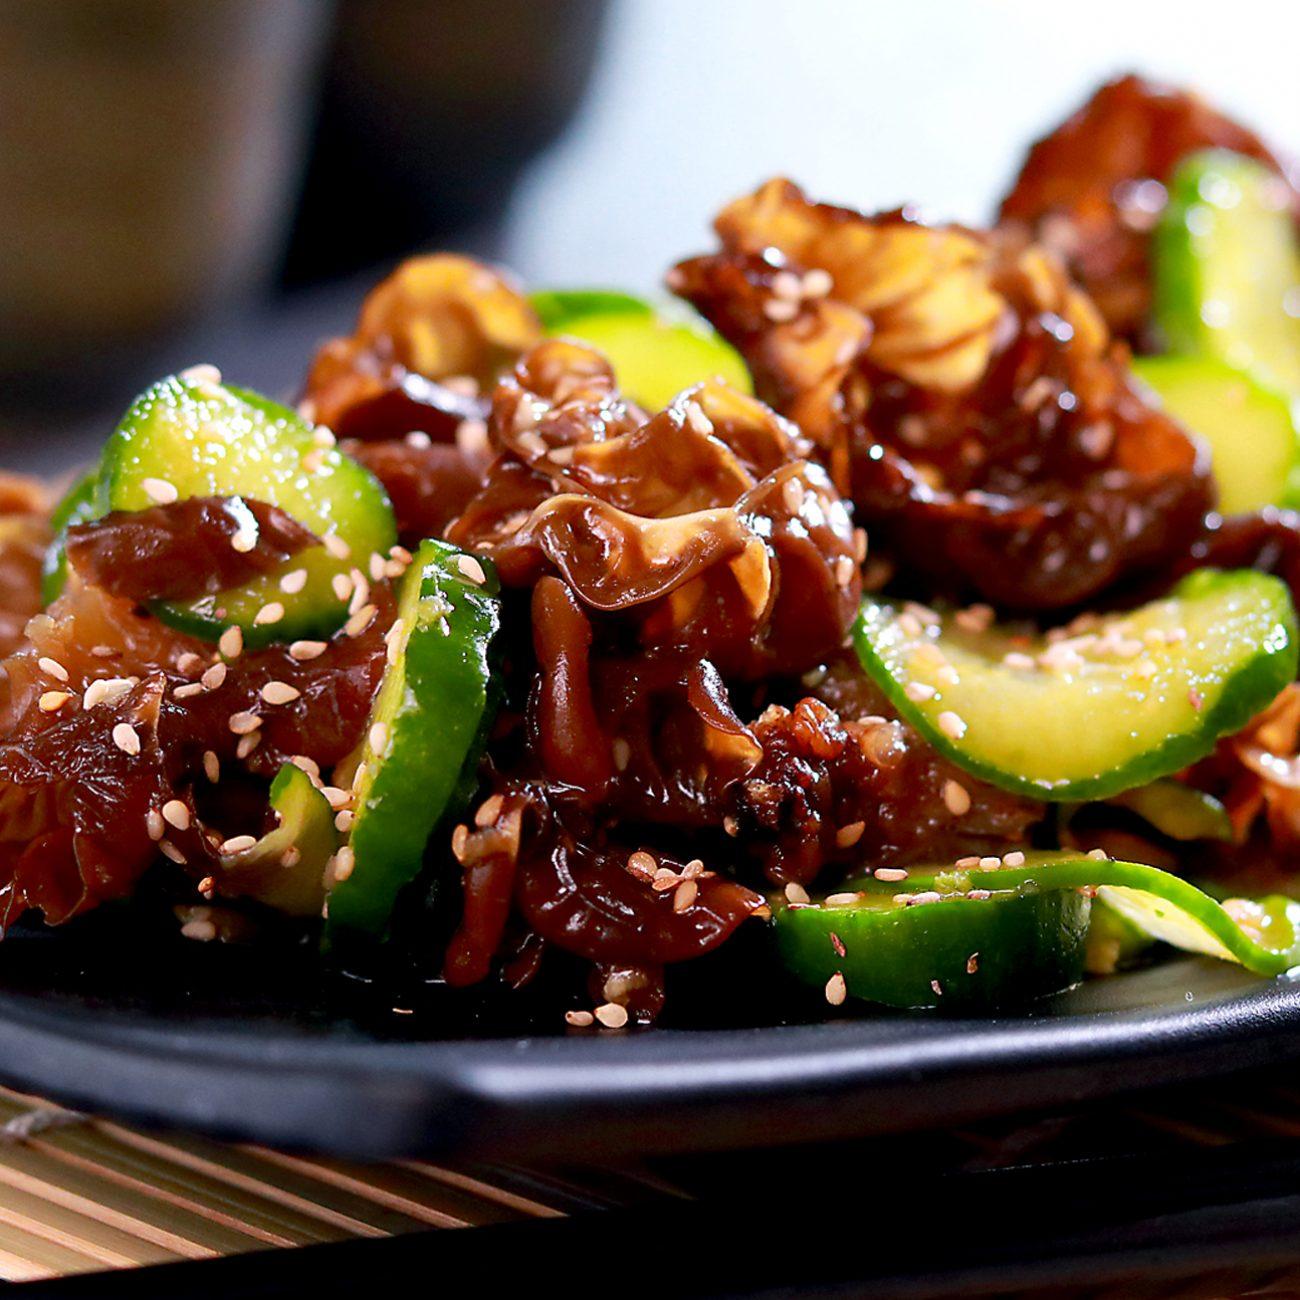 Chilled Cucumber and Wood Ear Mushroom Salad Recipe